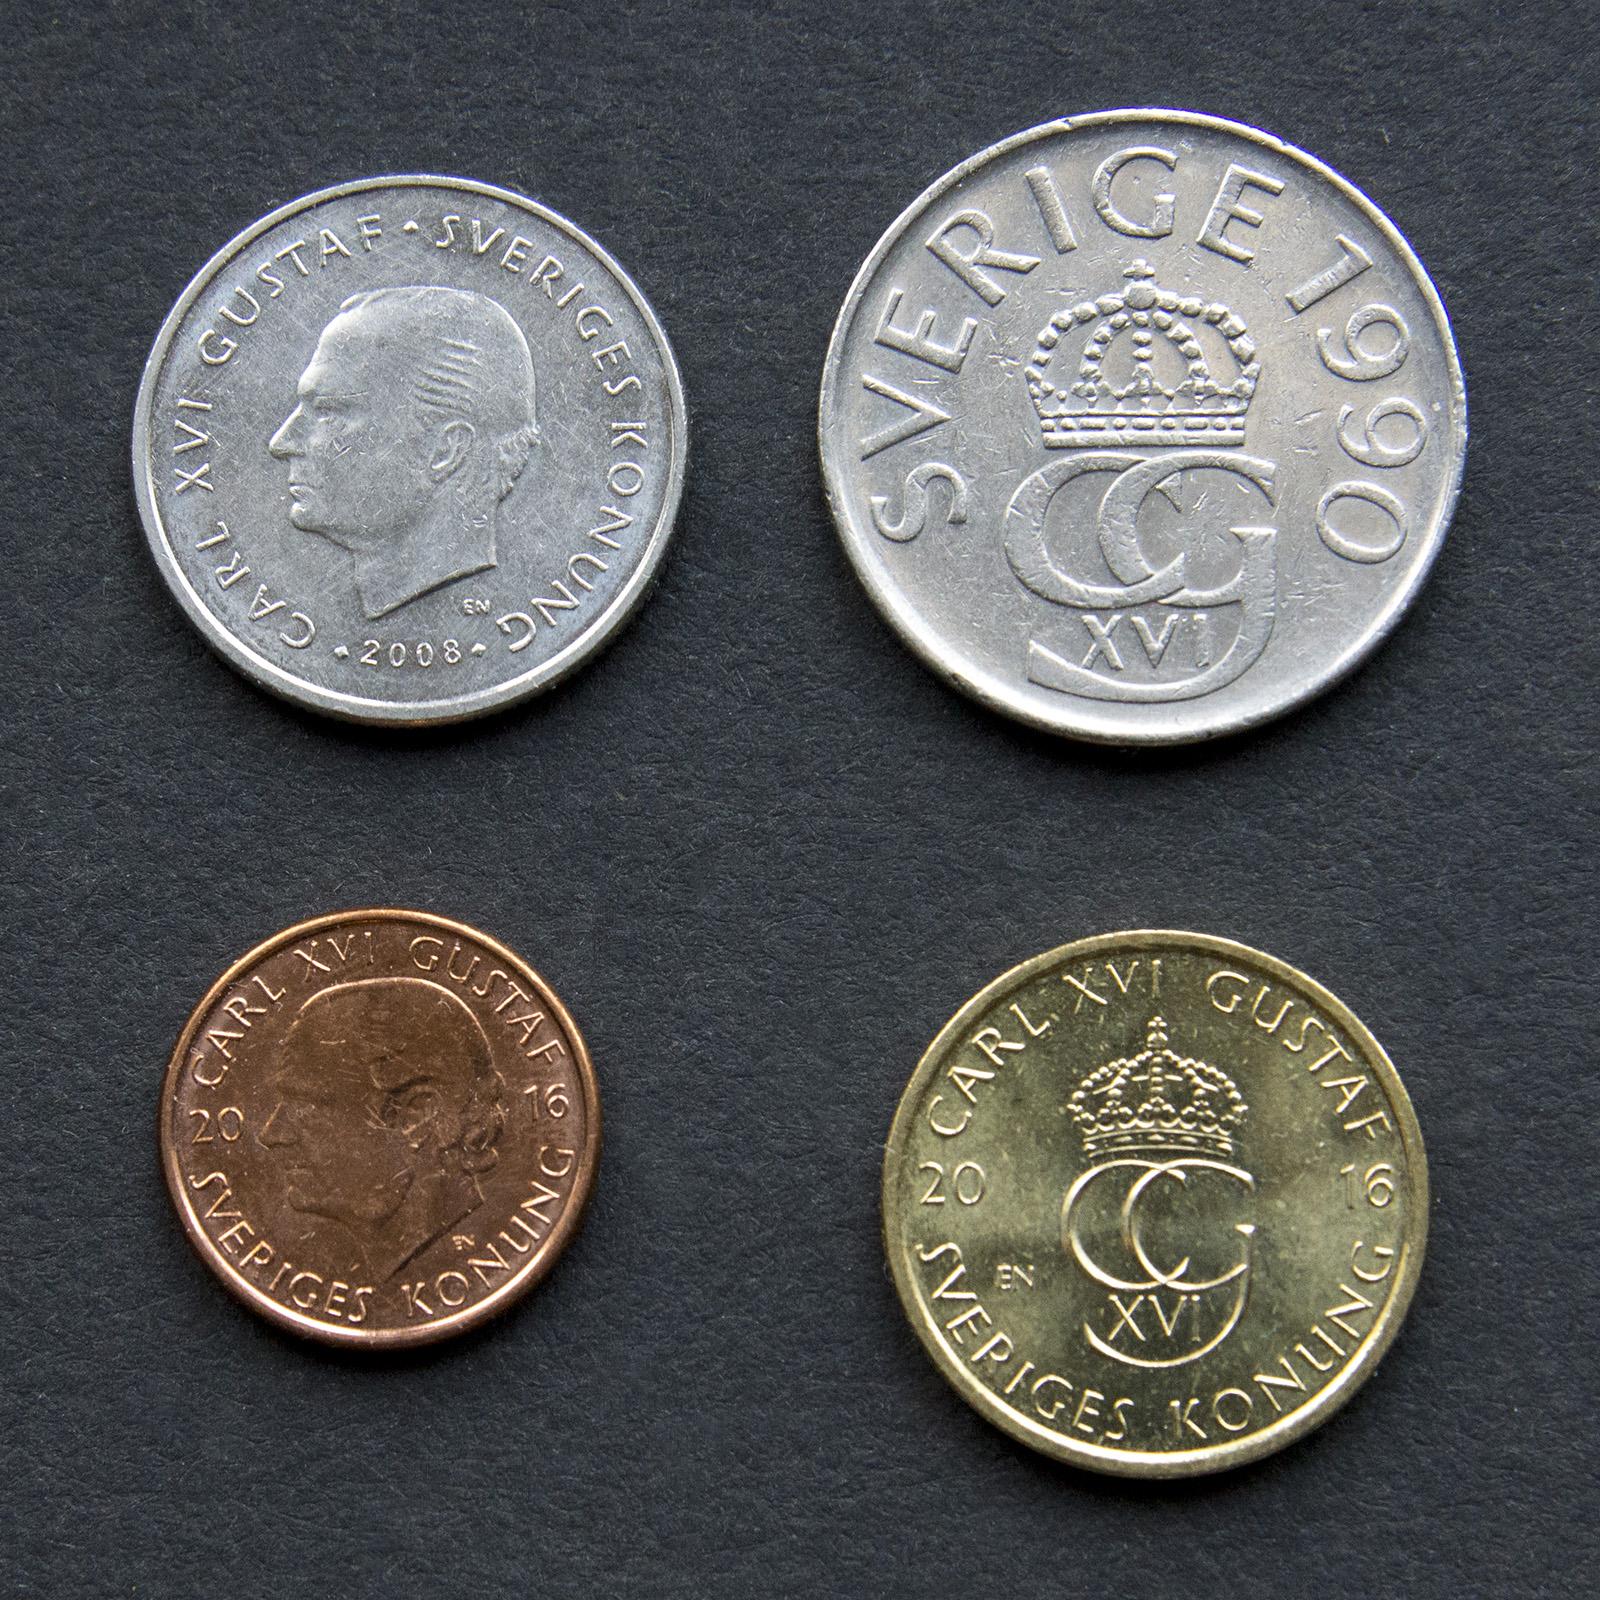 Hogre priser dar euron har inforts